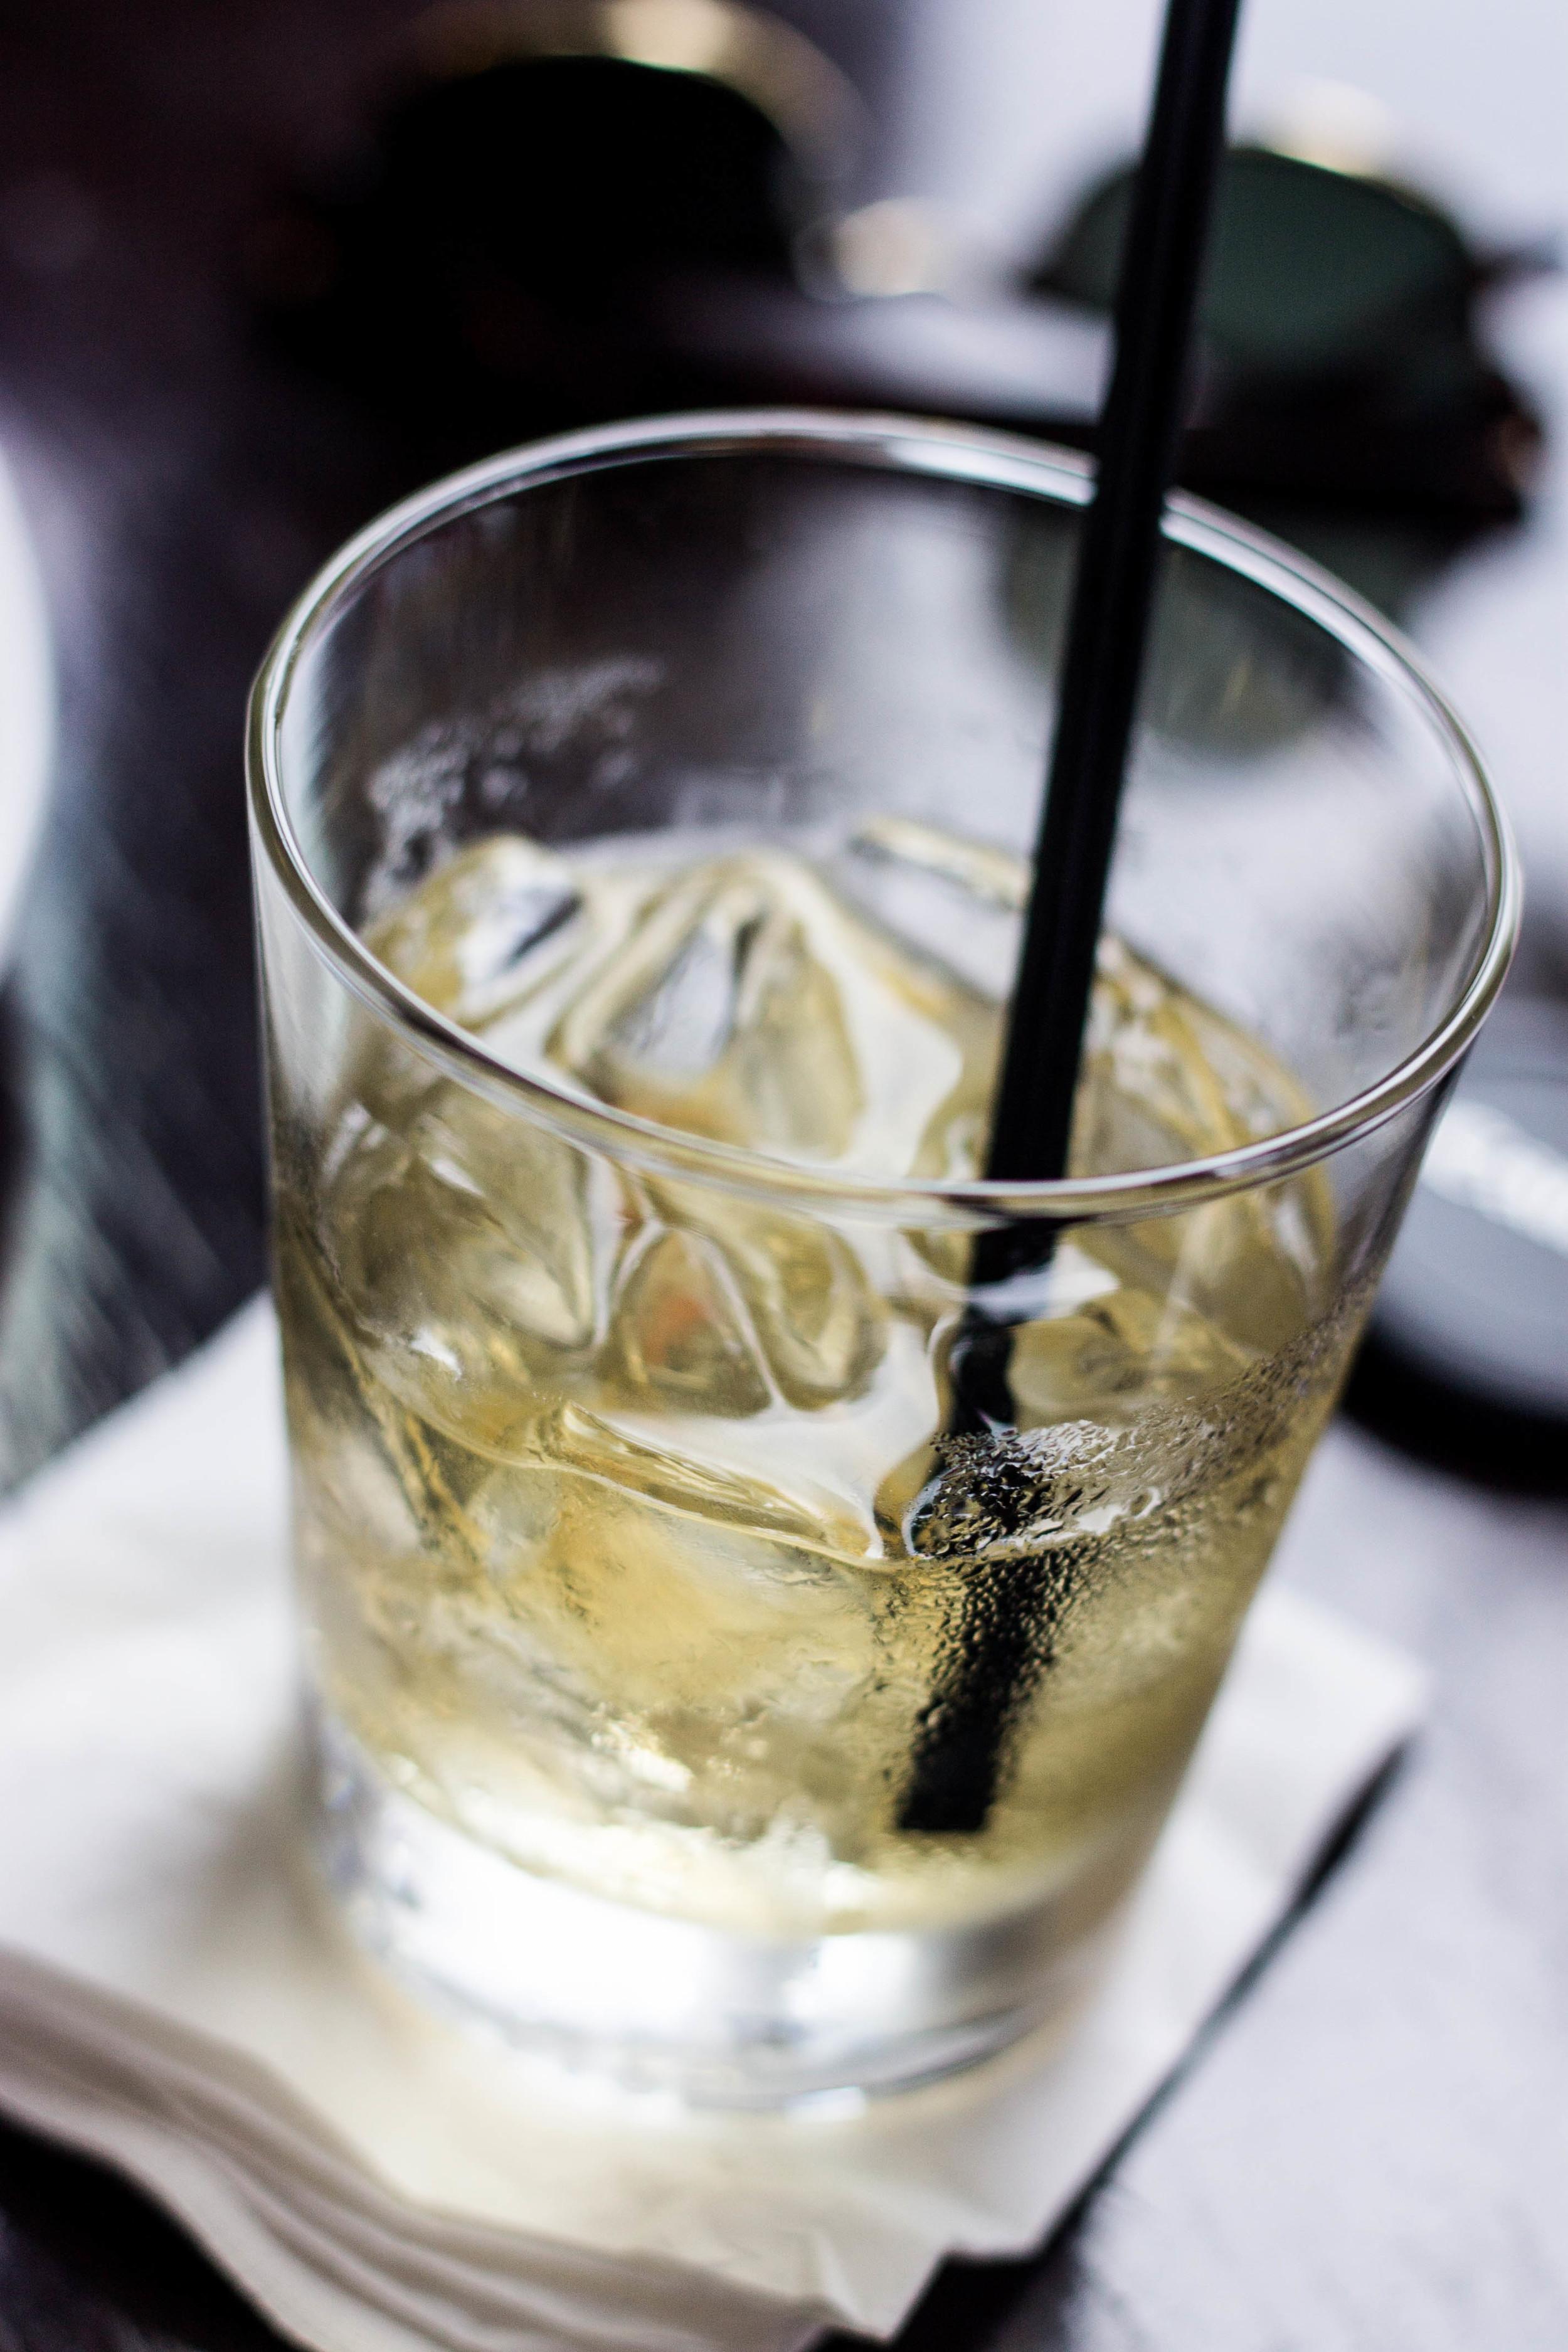 Burbon at Westport Cafe and Bar